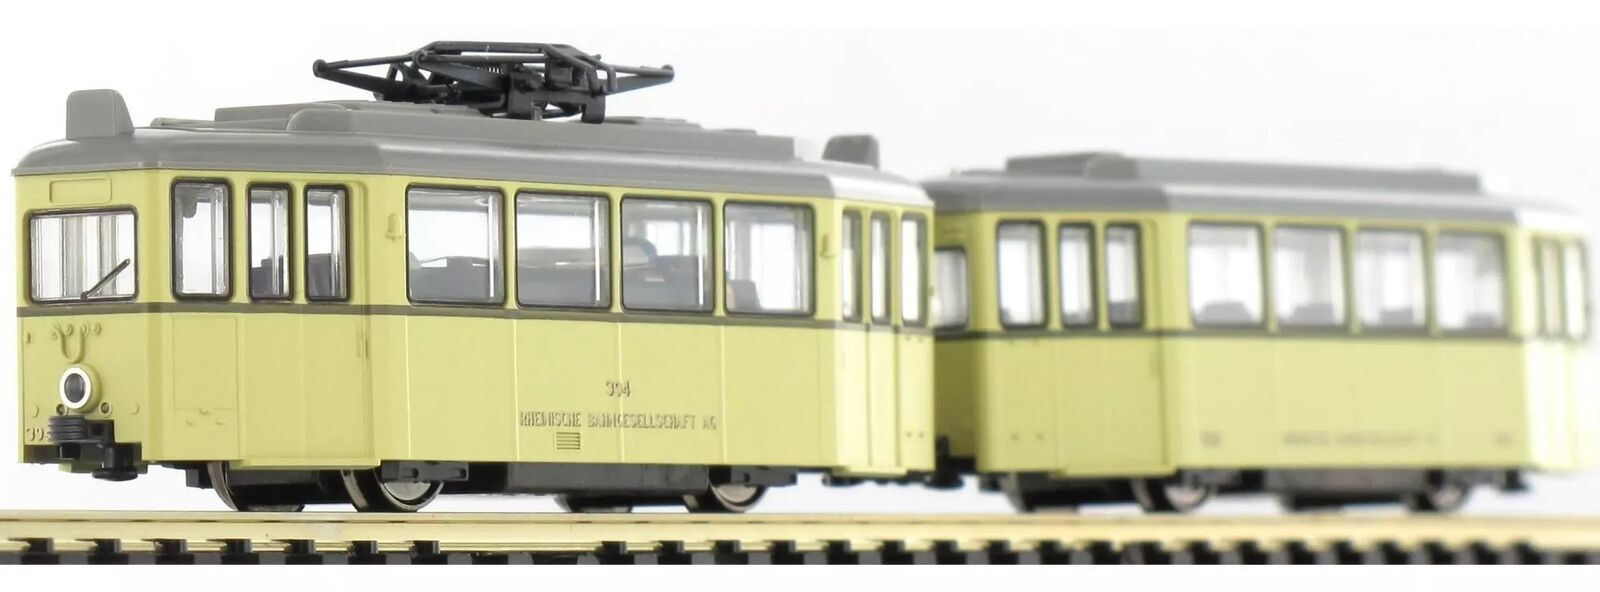 KATO K14600-0 K14600-0 K14600-0 N Scale Tram Strassenbahn b5cc32